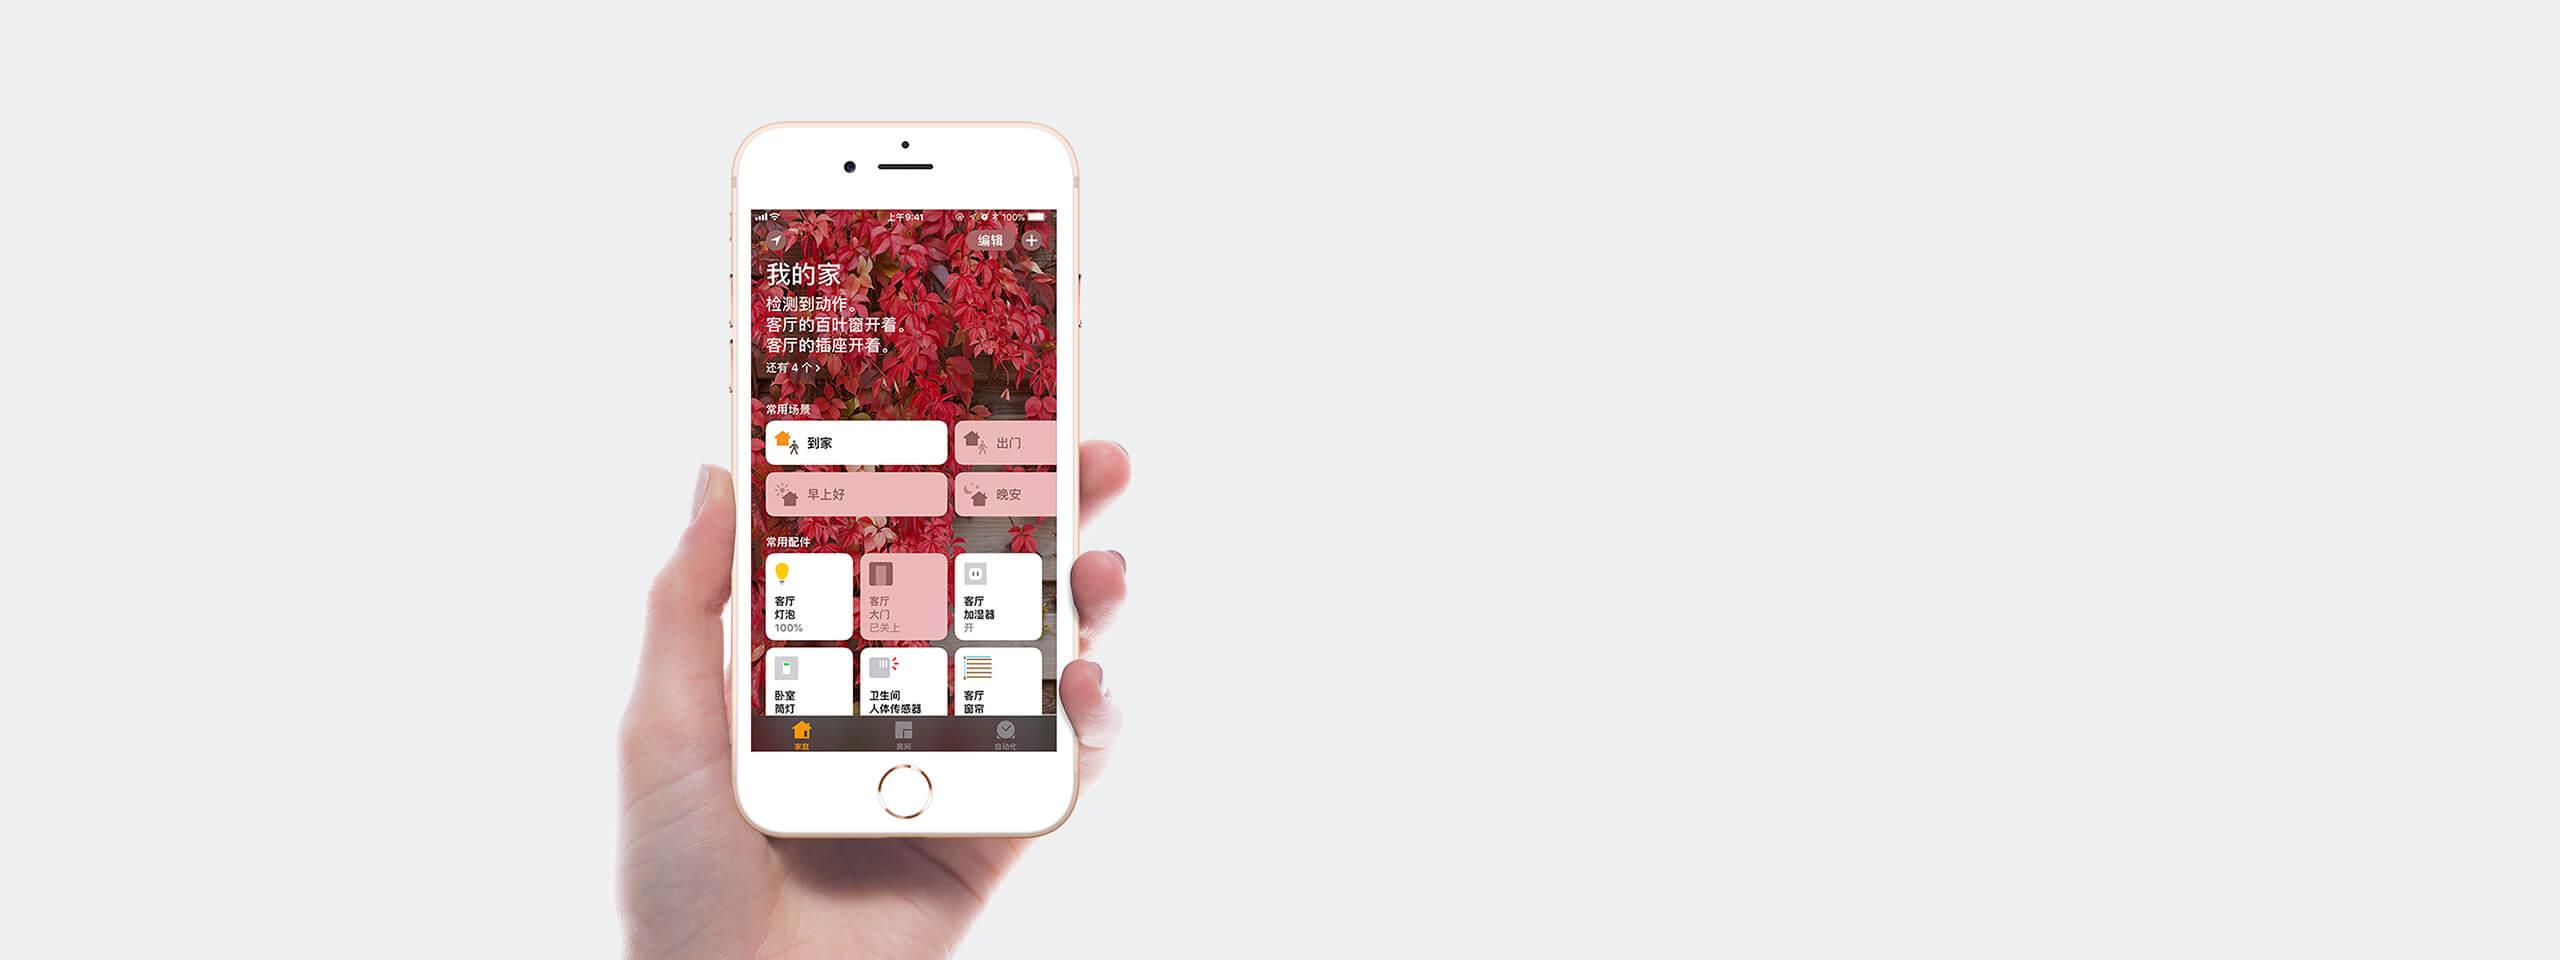 Aqara 智能无线开关 - 兼容Apple HomeKit智能家居平台